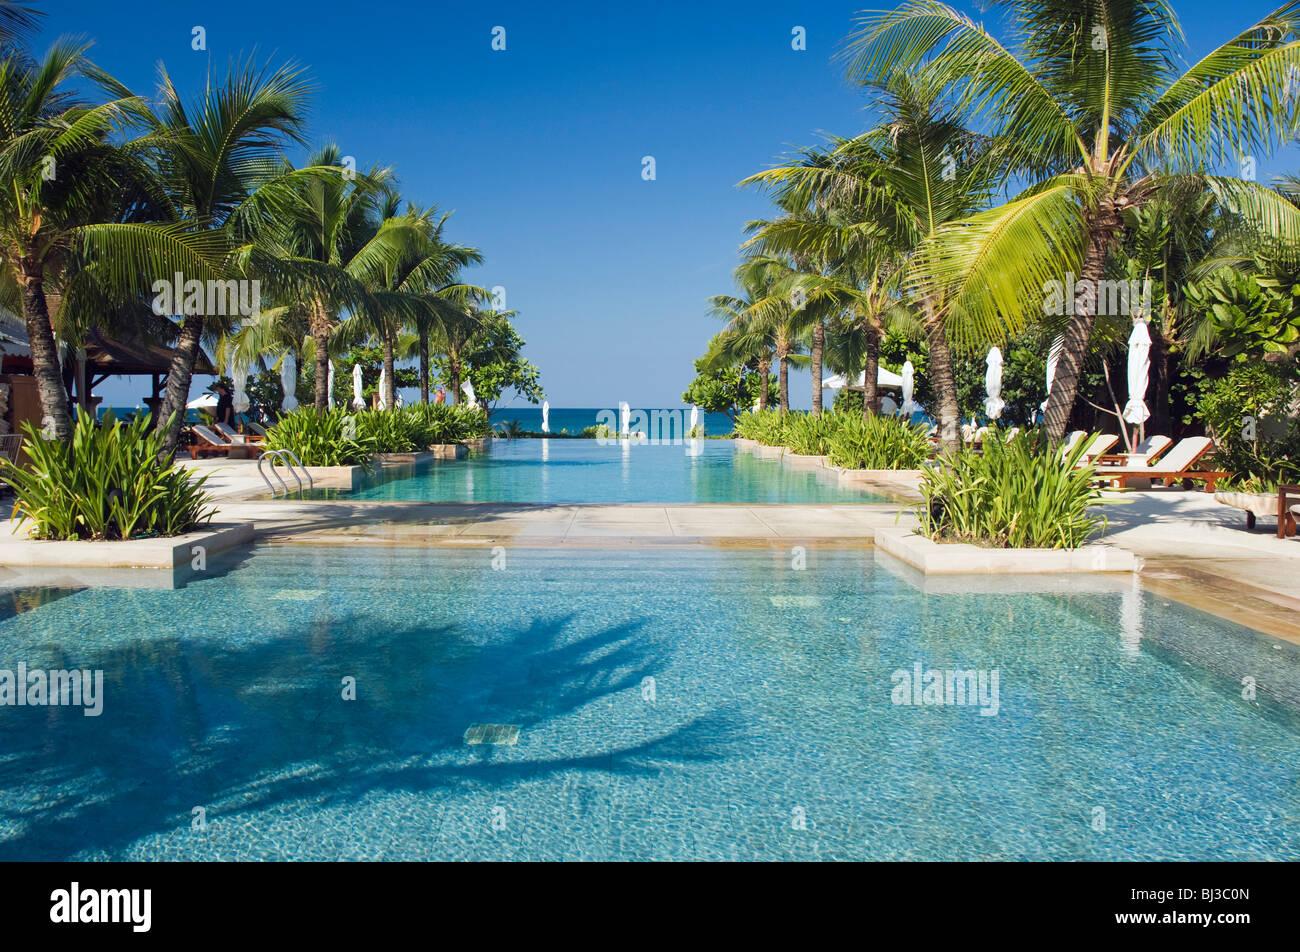 Ling Beach Island Bj